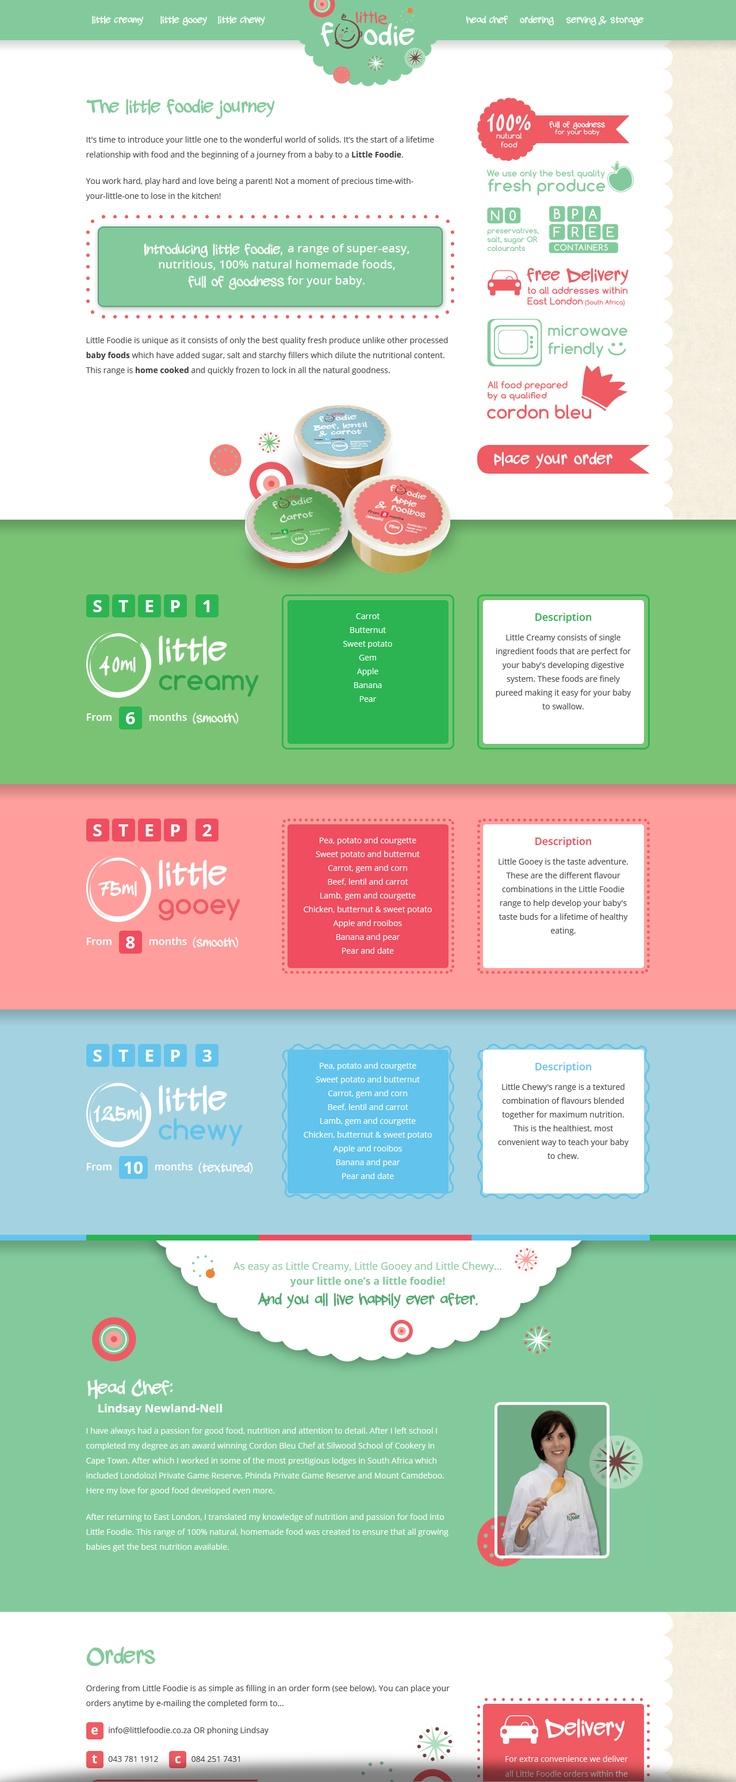 Website design for Little Foodie